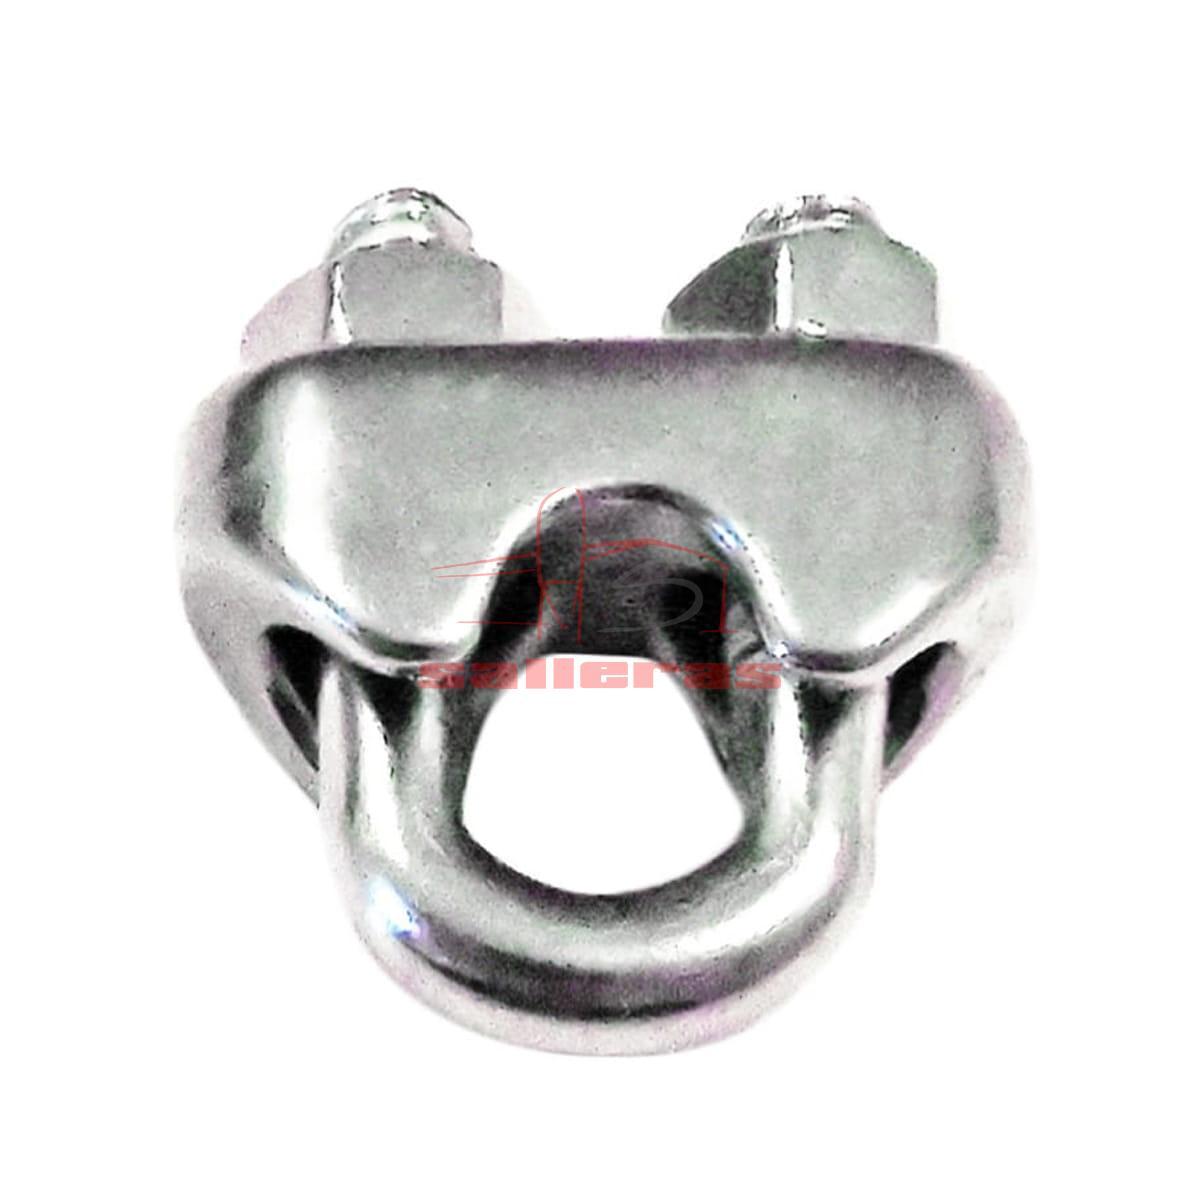 Sujetacable de acero inoxidable con doble tornillo revés